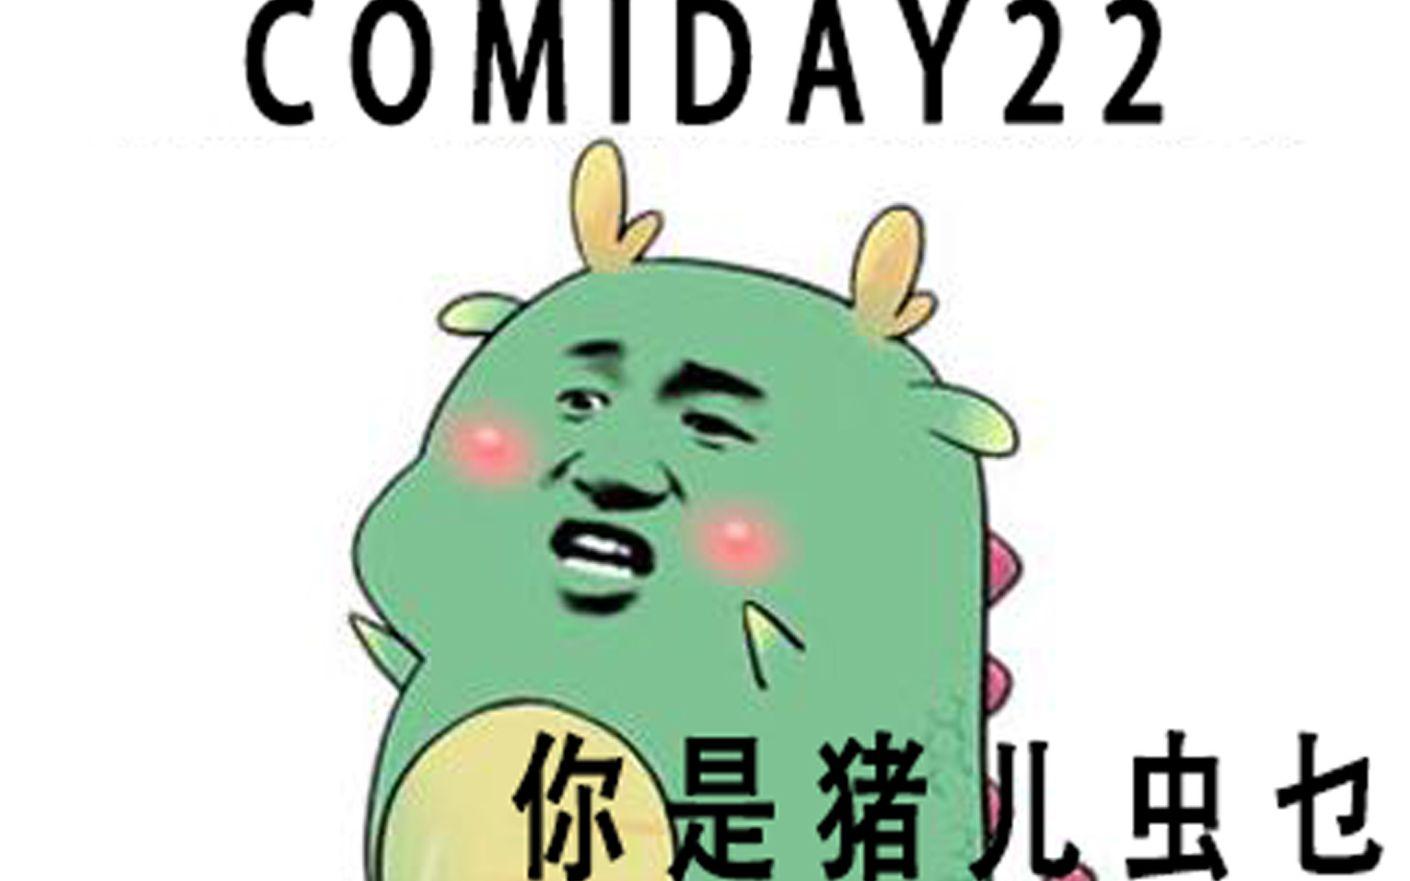 【2018漫展】成都COMIDAY22(8.4-8.5)